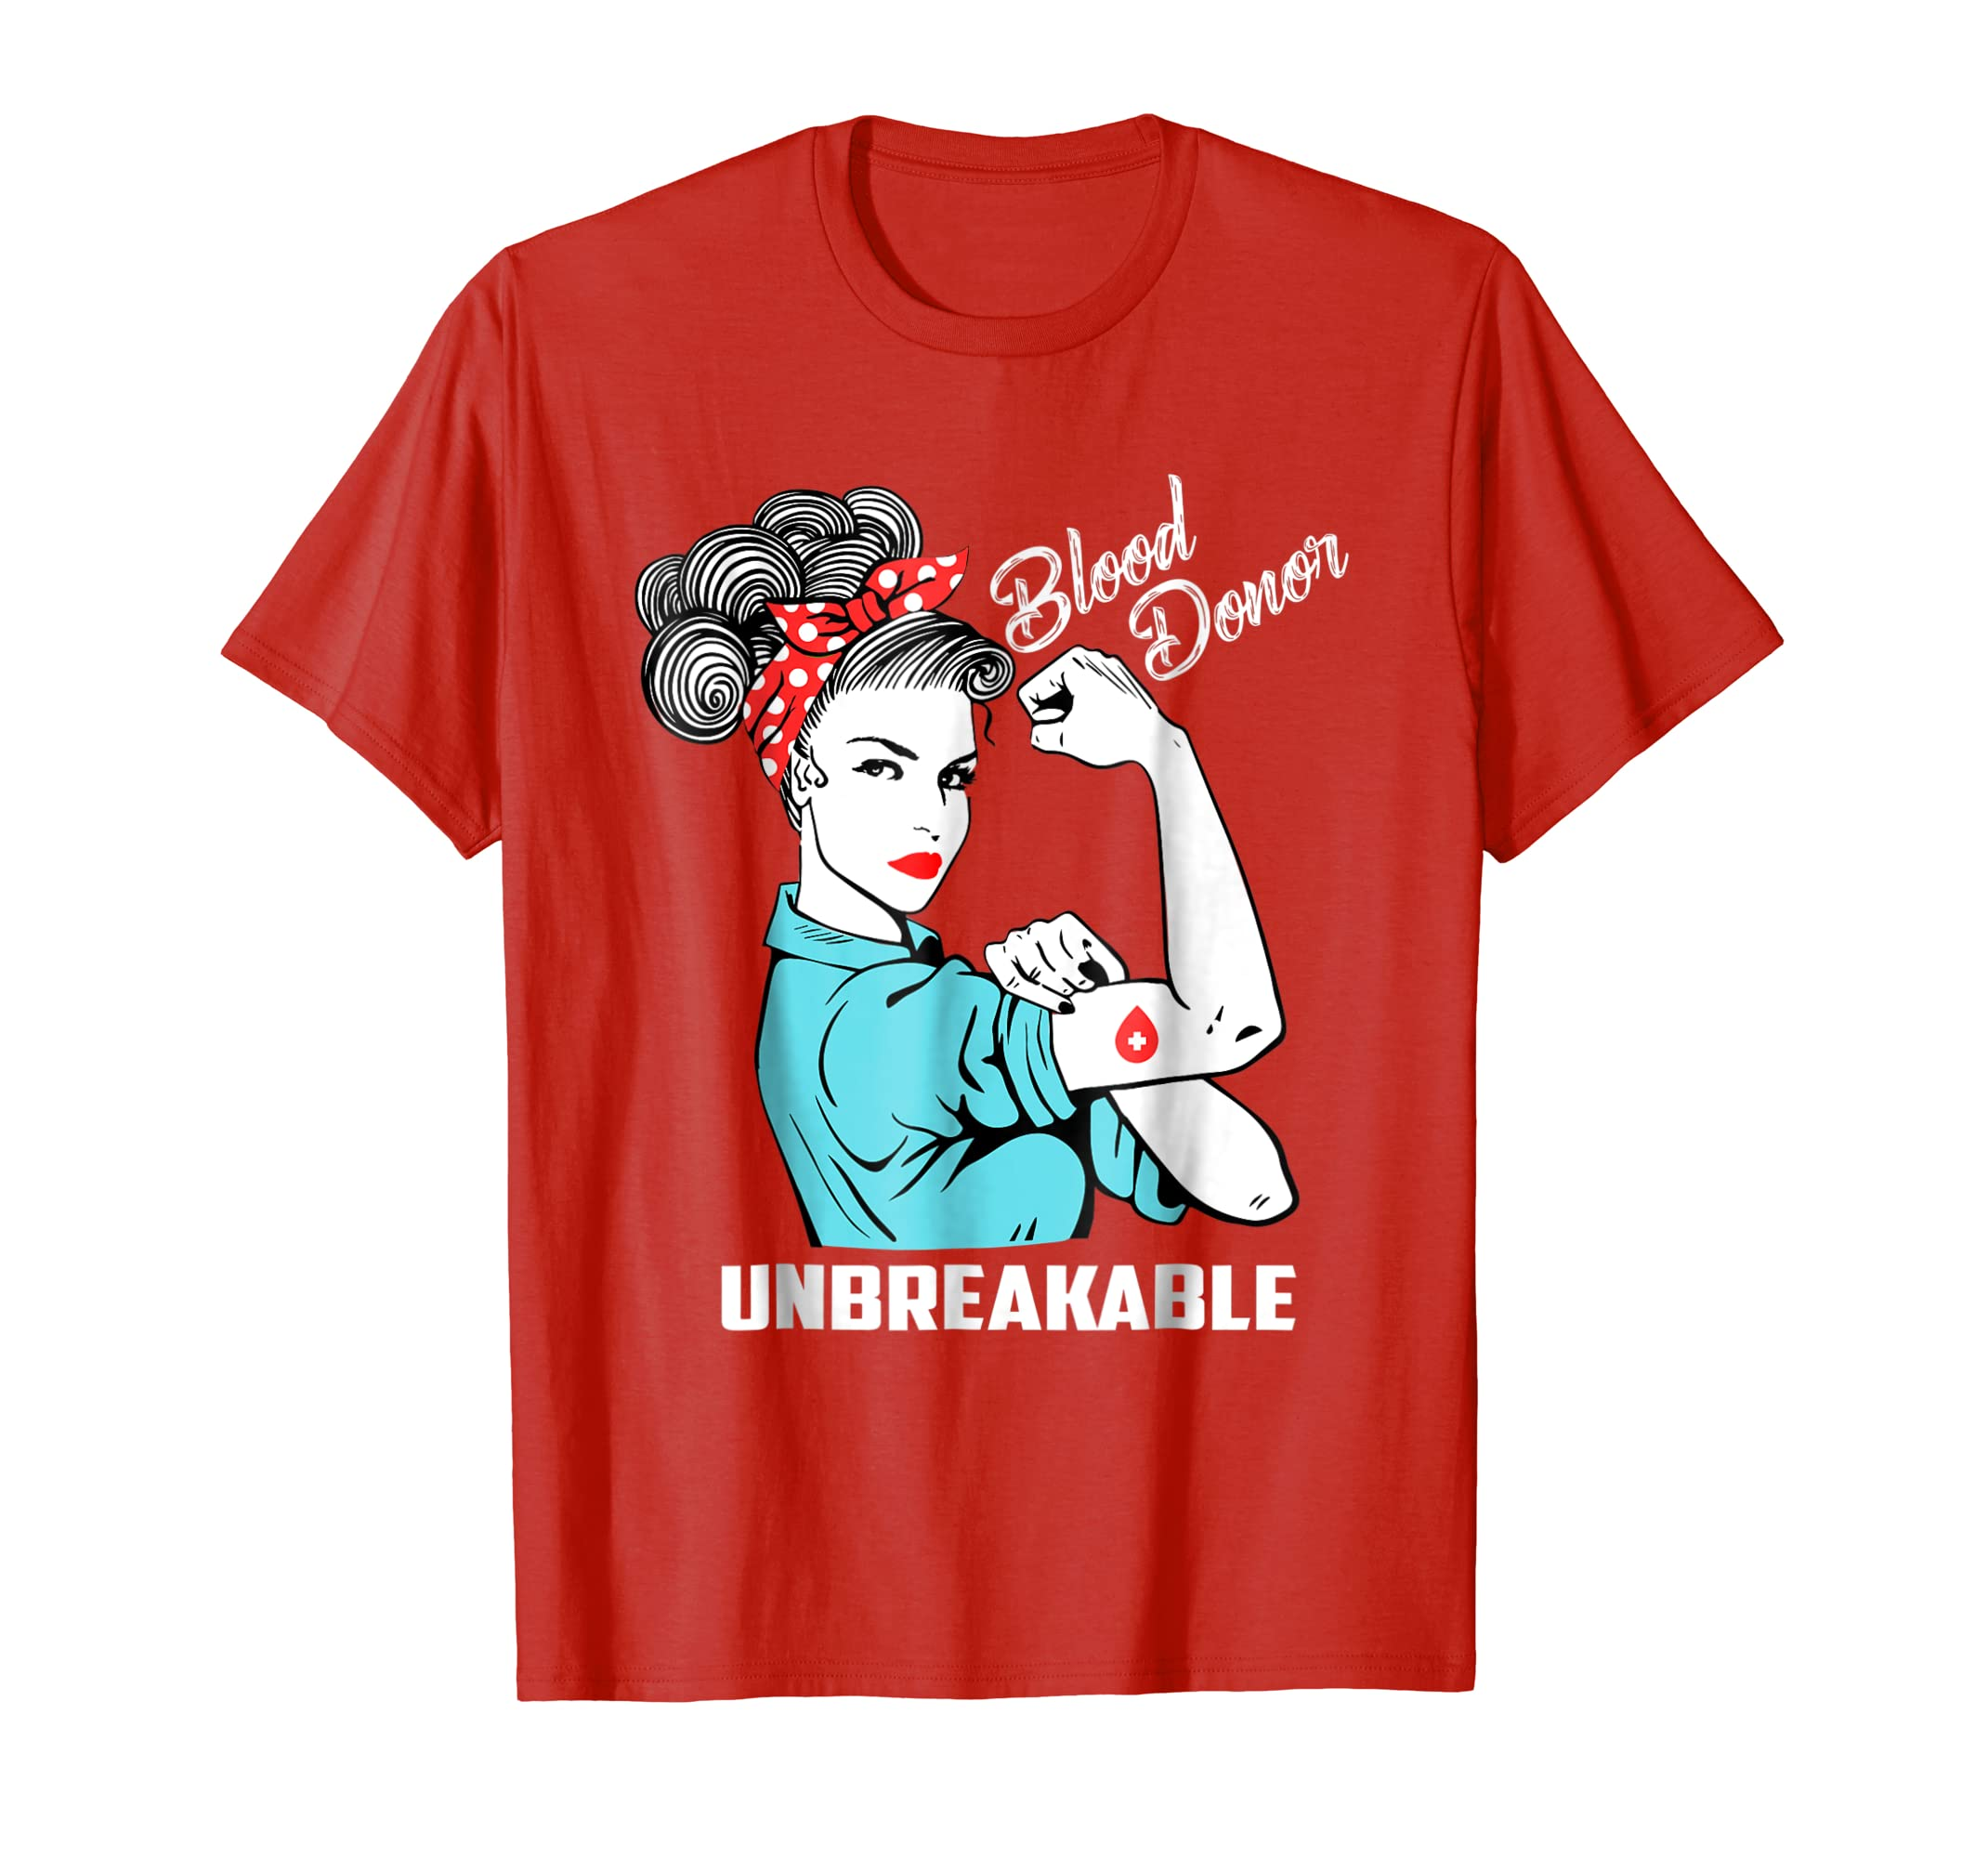 Blood Donor Unbreakable T Shirt Blood Donation Awareness-azvn